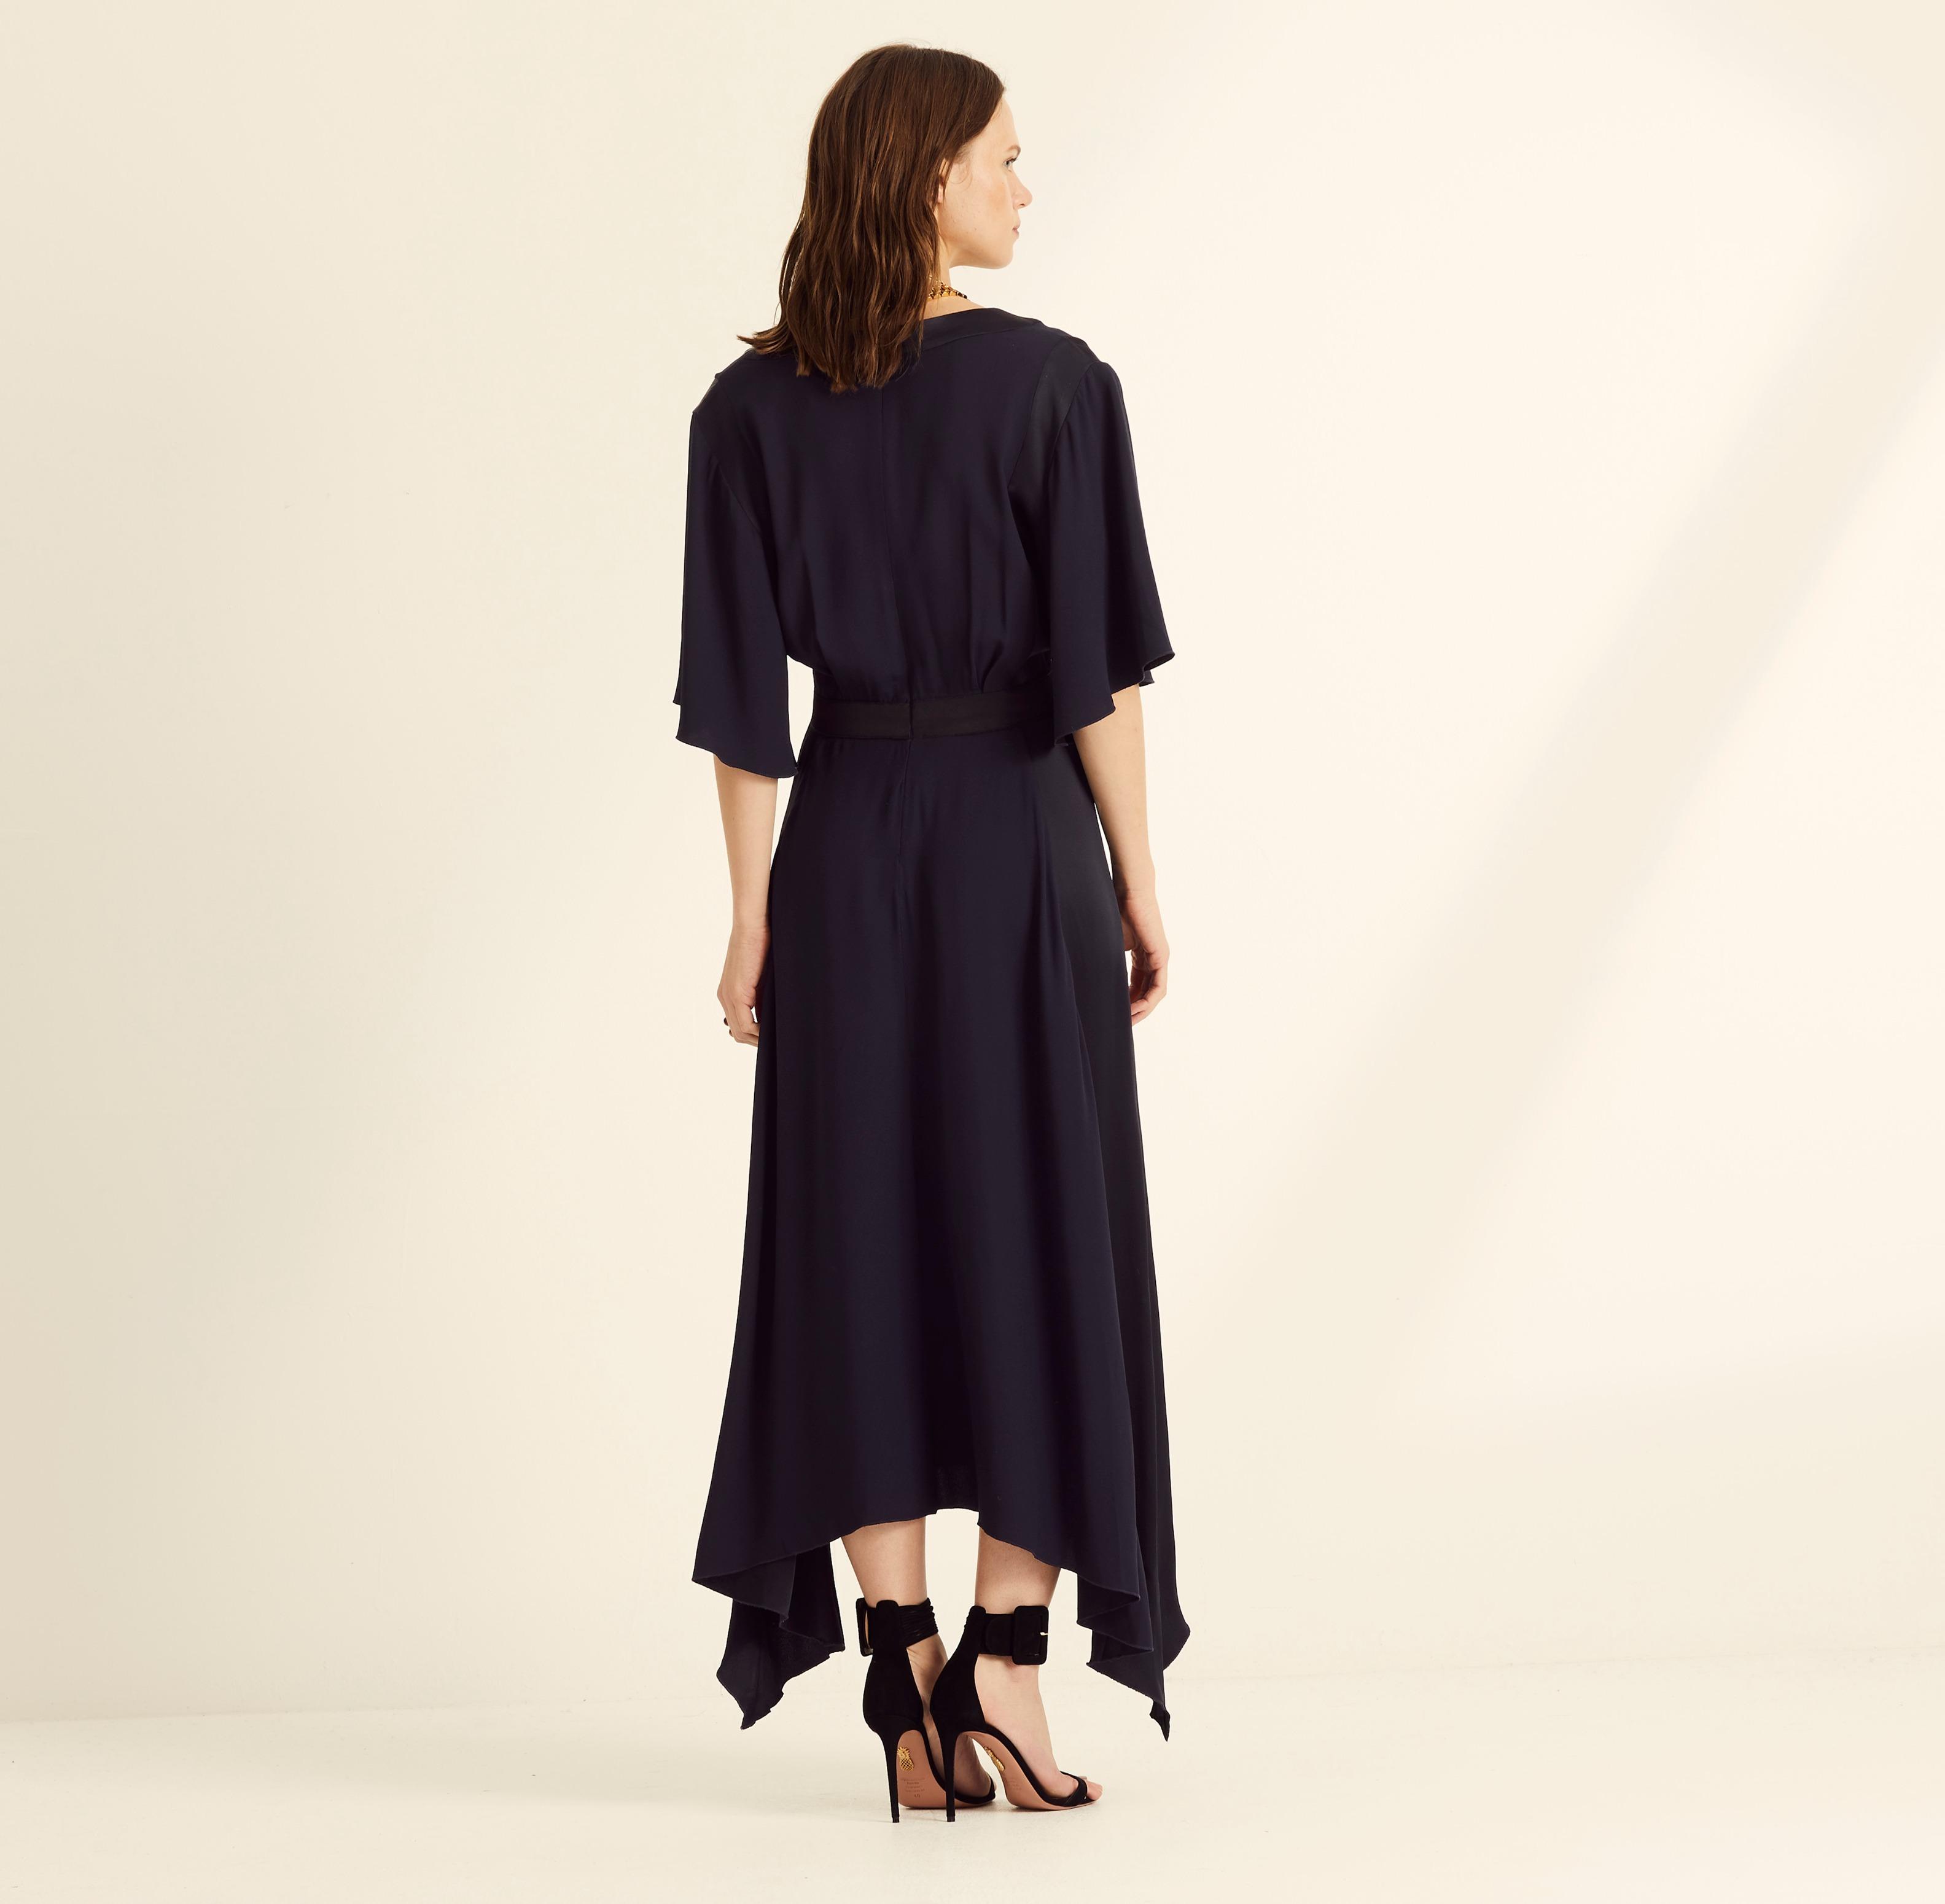 2cdc1b37bda Elegant Long Evening Dresses House Of Fraser - Gomes Weine AG